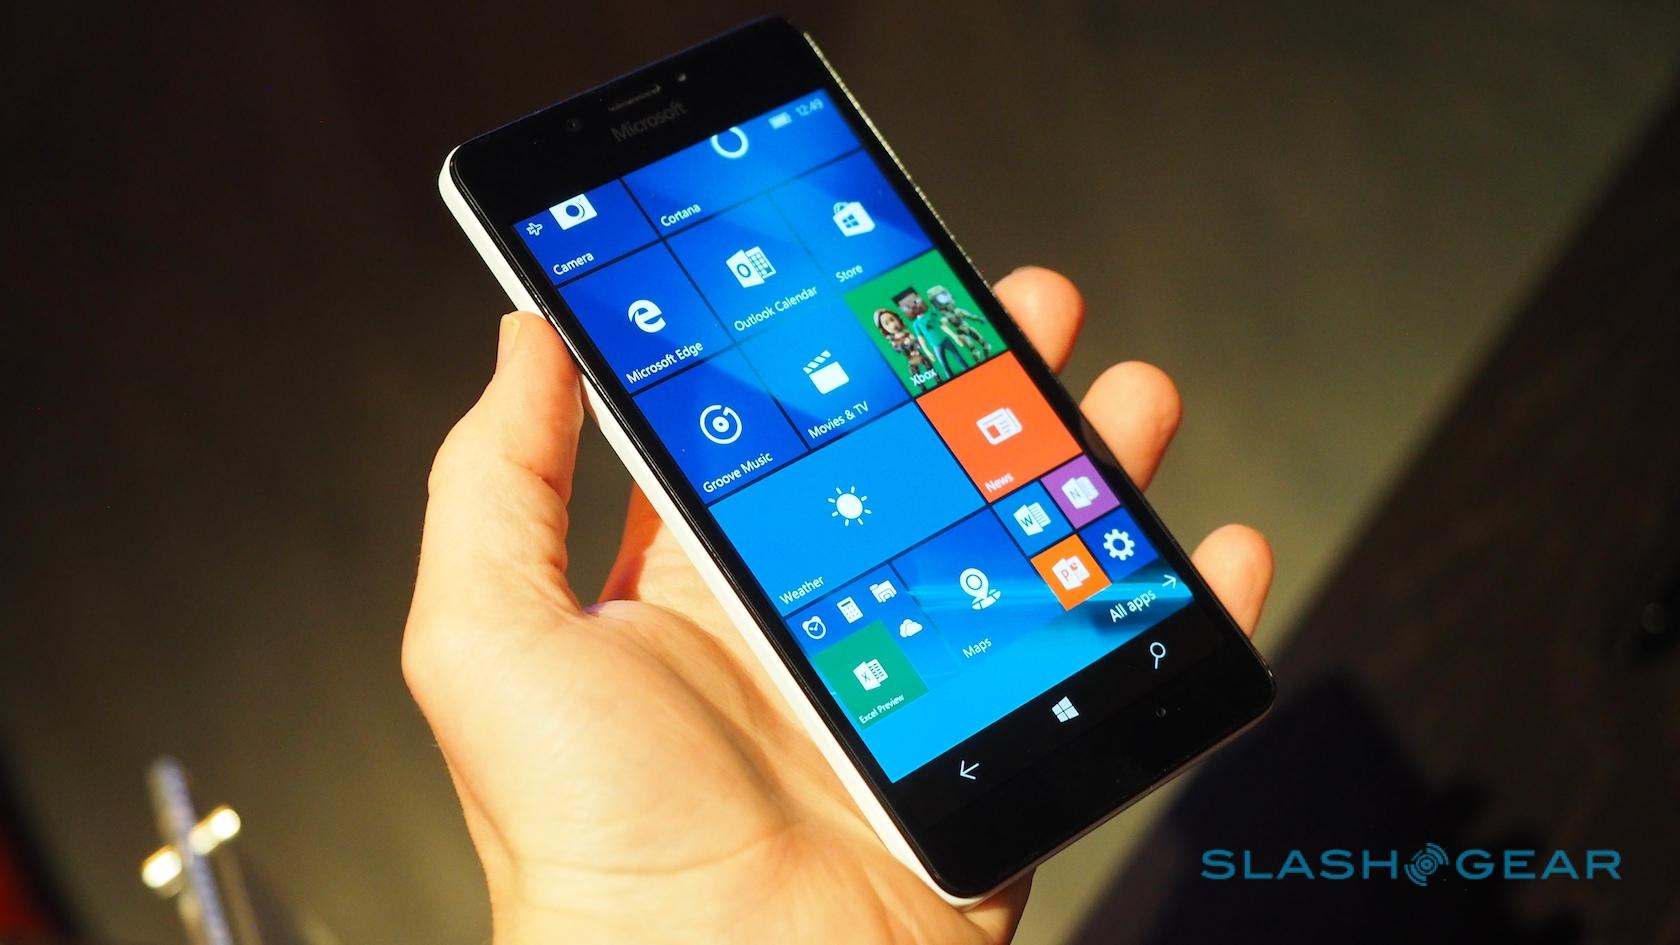 Microsoft Lumia 950 XL and 950 hands-on - SlashGear